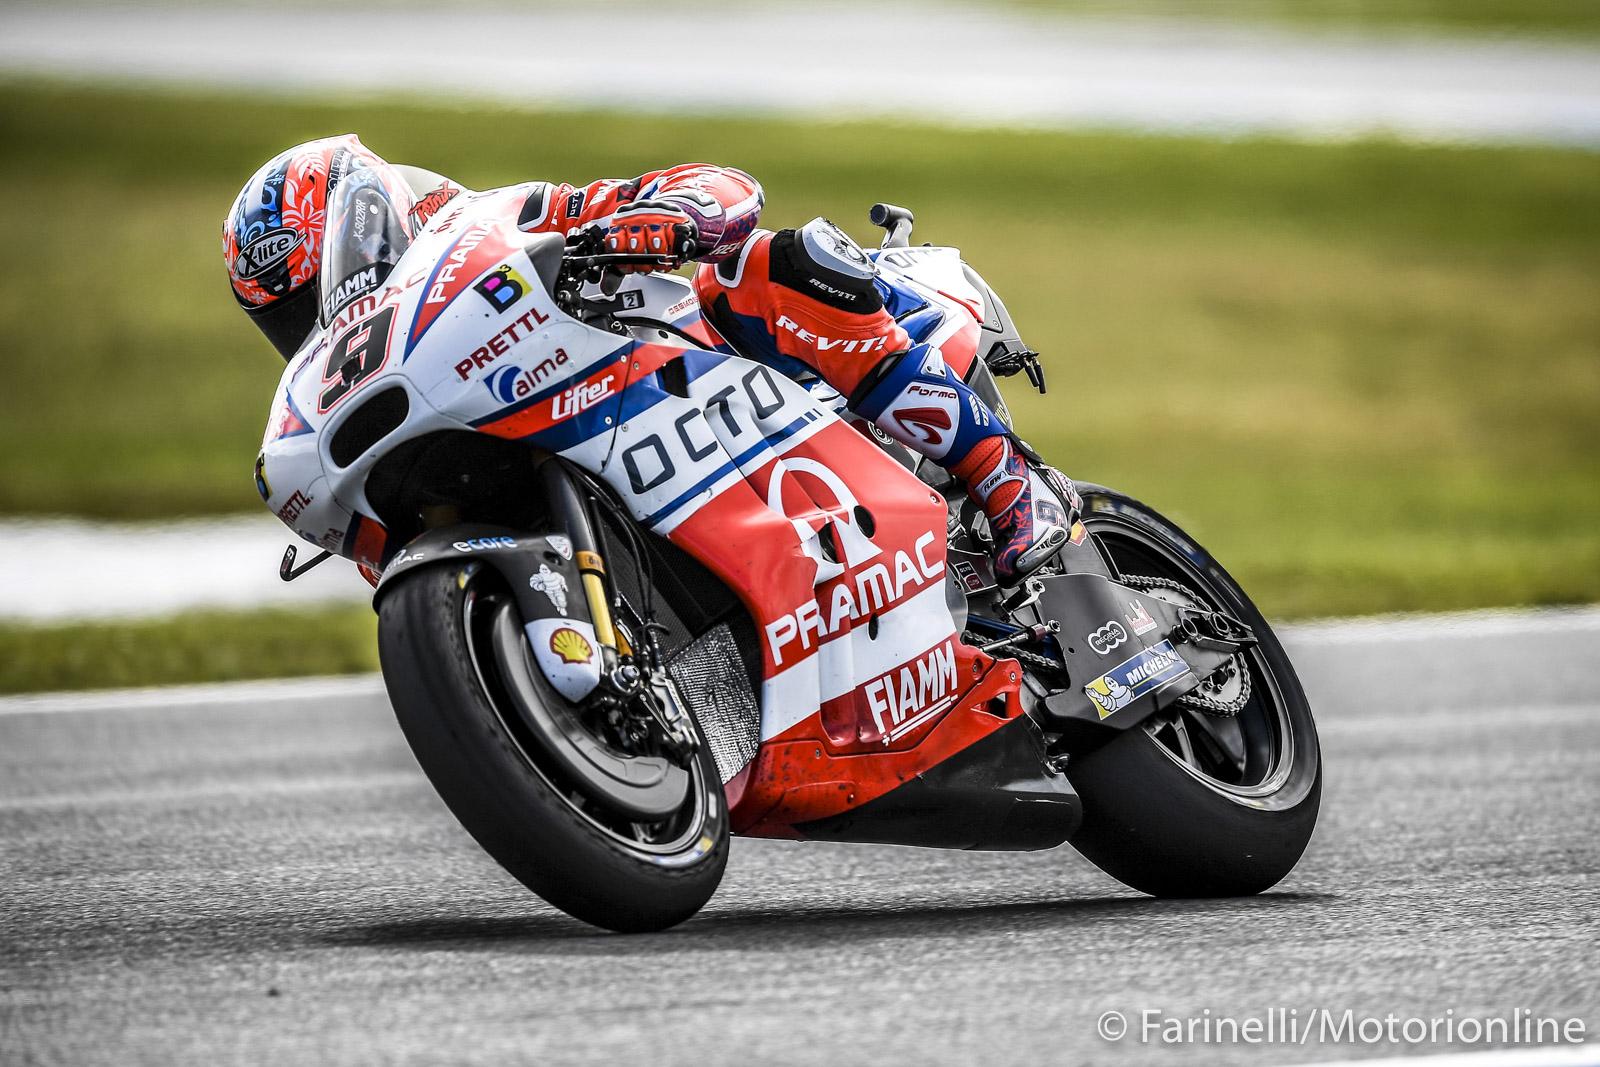 MotoGP Phillip Island RACE Foto MotoGP alta risoluzione 19 di 124